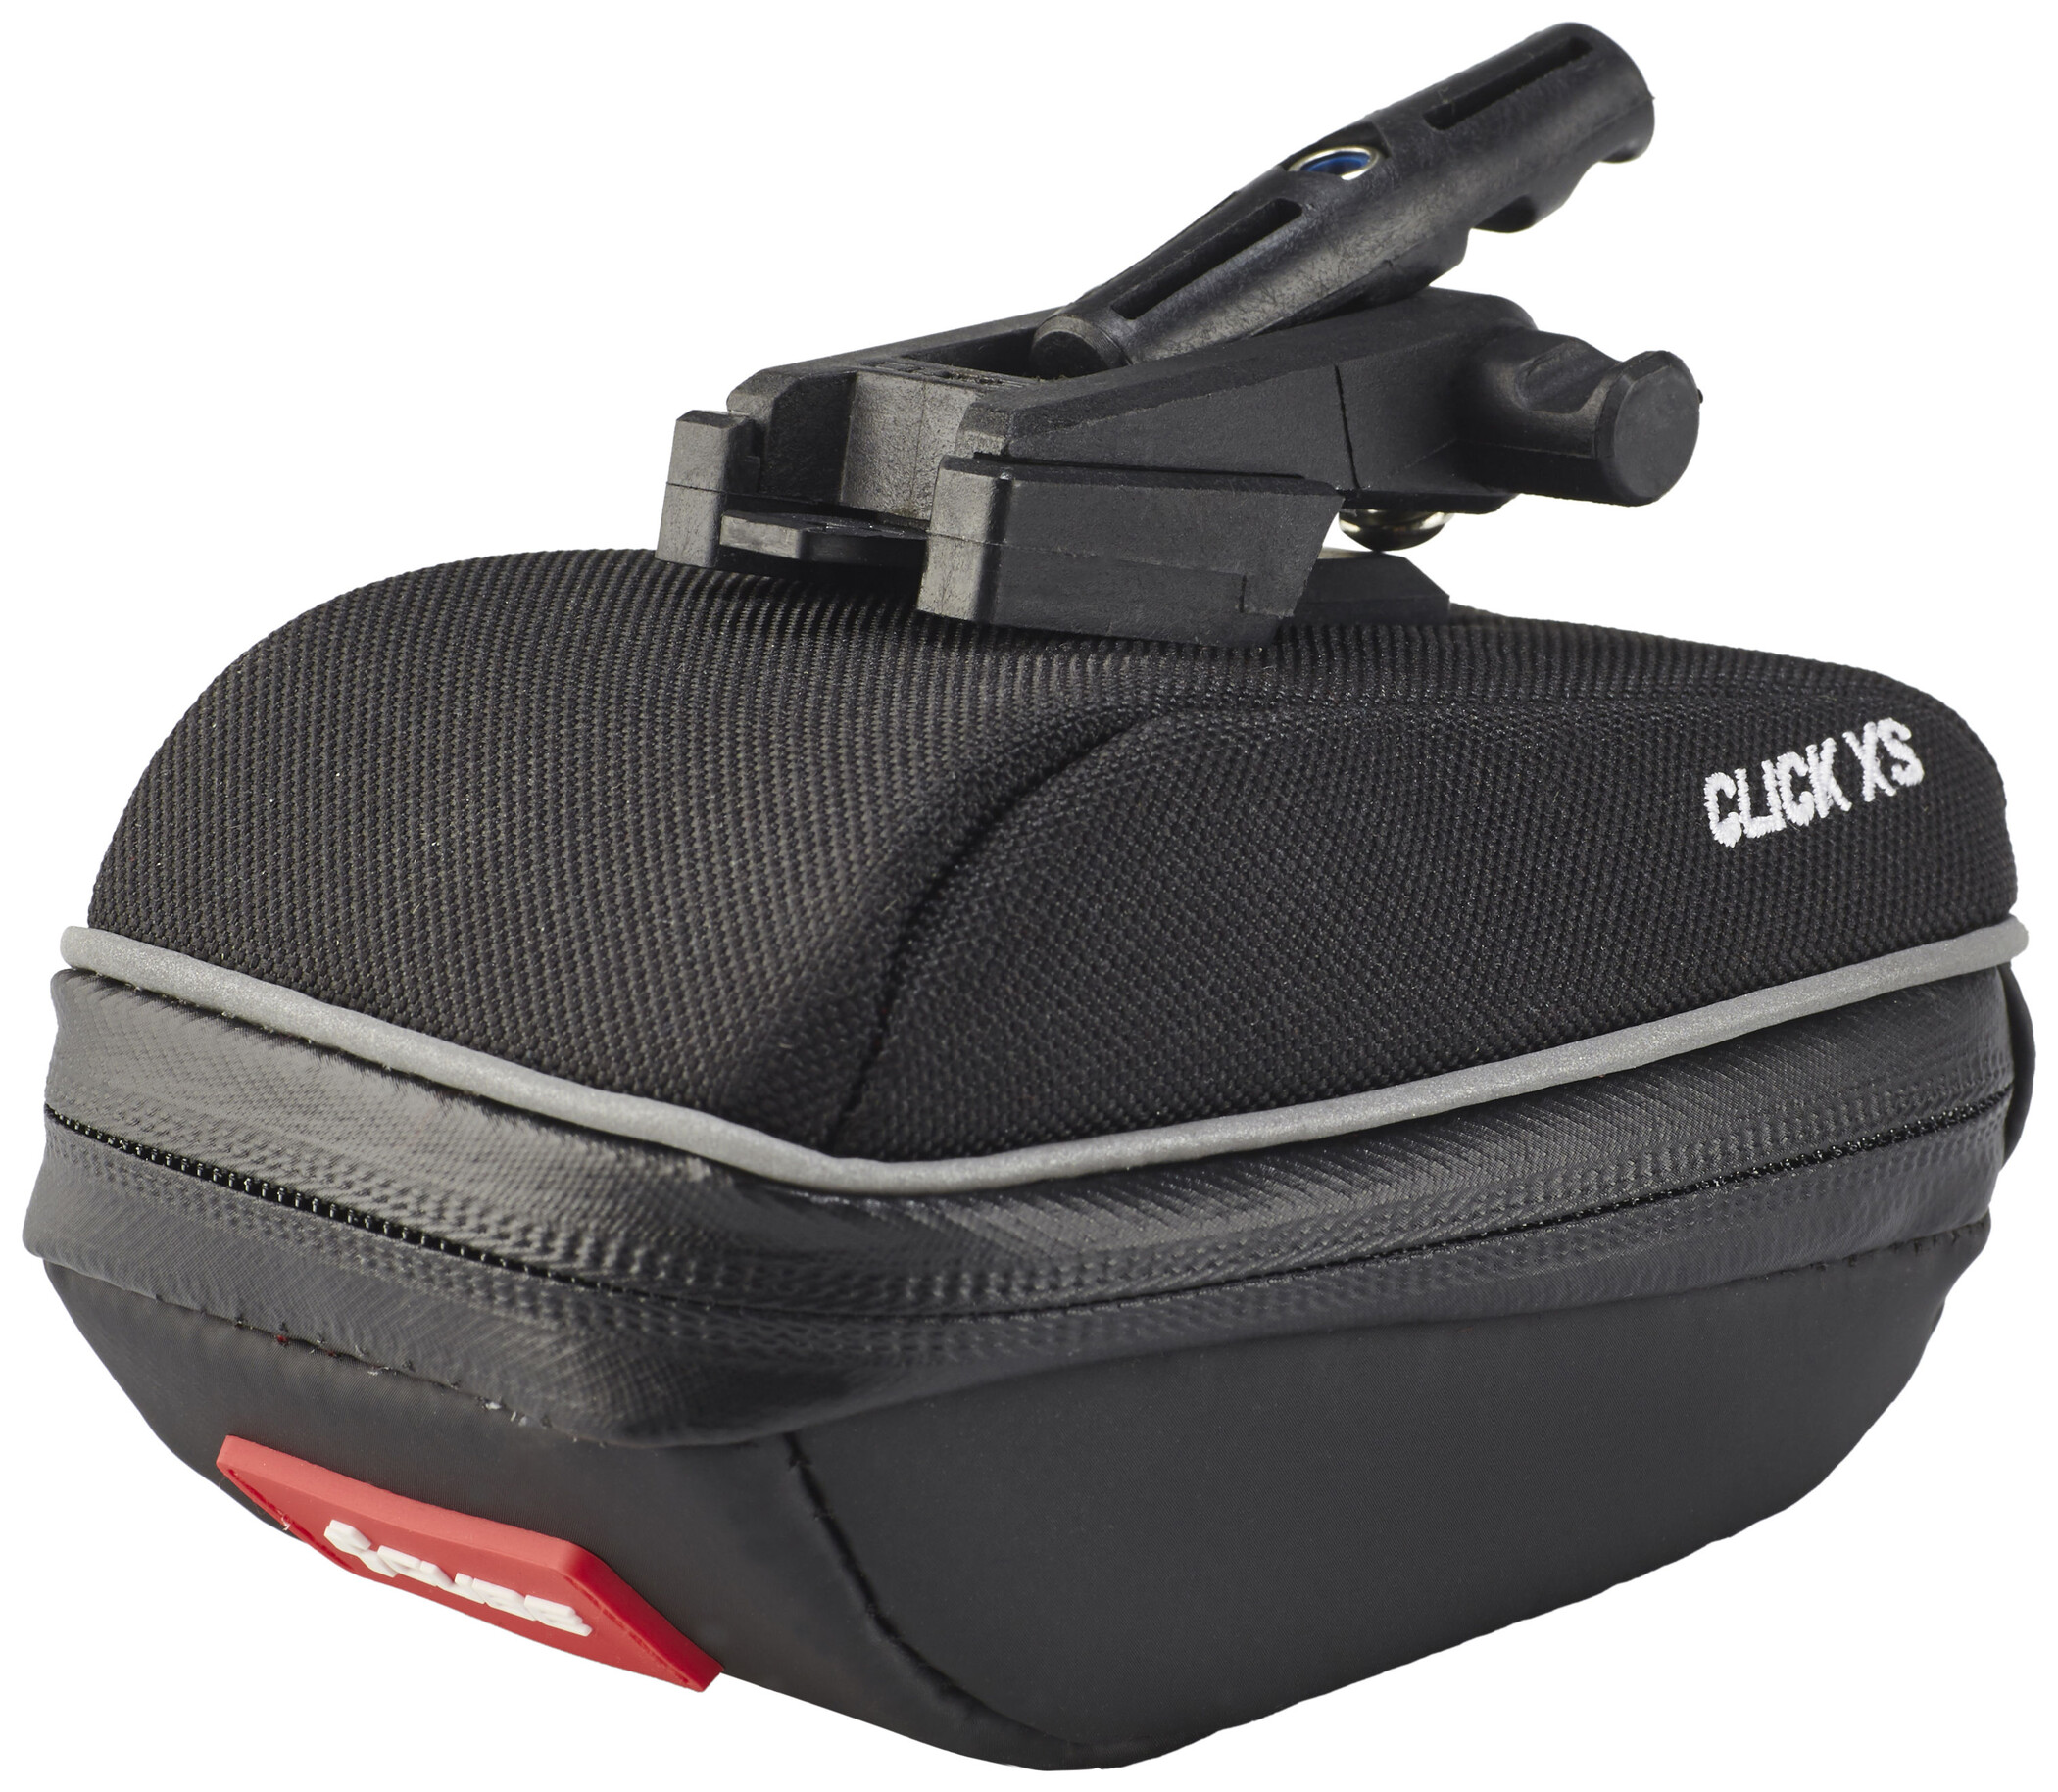 Cube Click Cykeltaske XS, black (2019) | Saddle bags